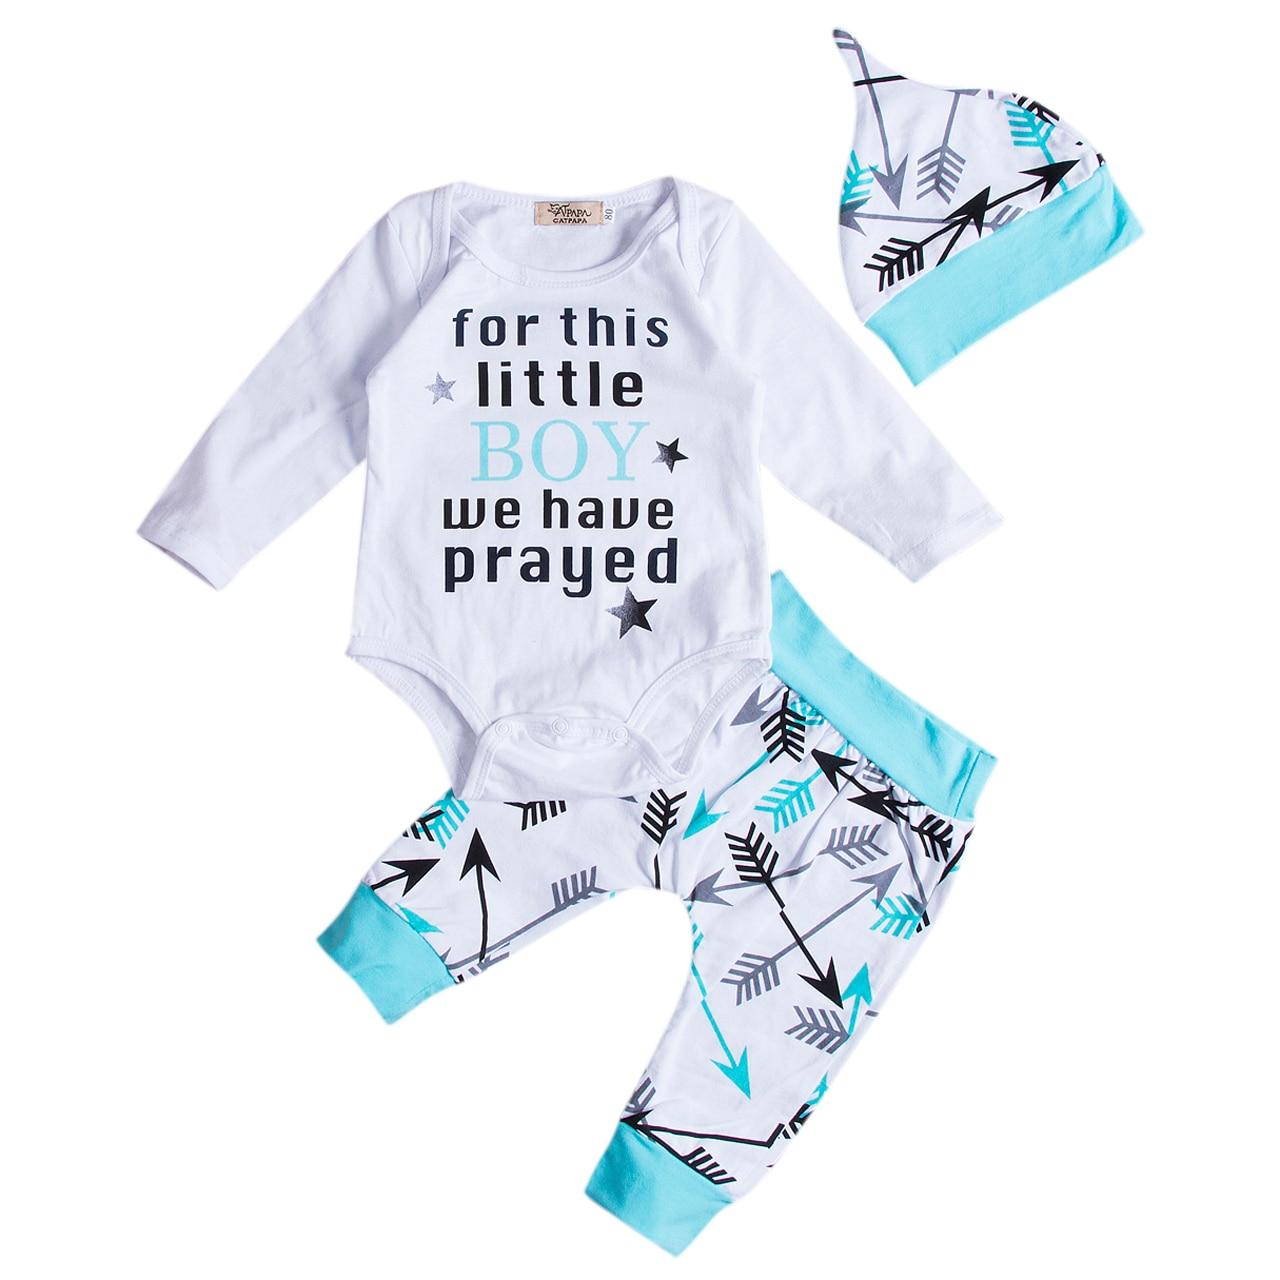 Pudcoco 3PCS Toddler Infant Baby Boys Clothes Cotton Long Sleeve Letter Printed Bodysuit Pants Leggings Hat Outfits Set